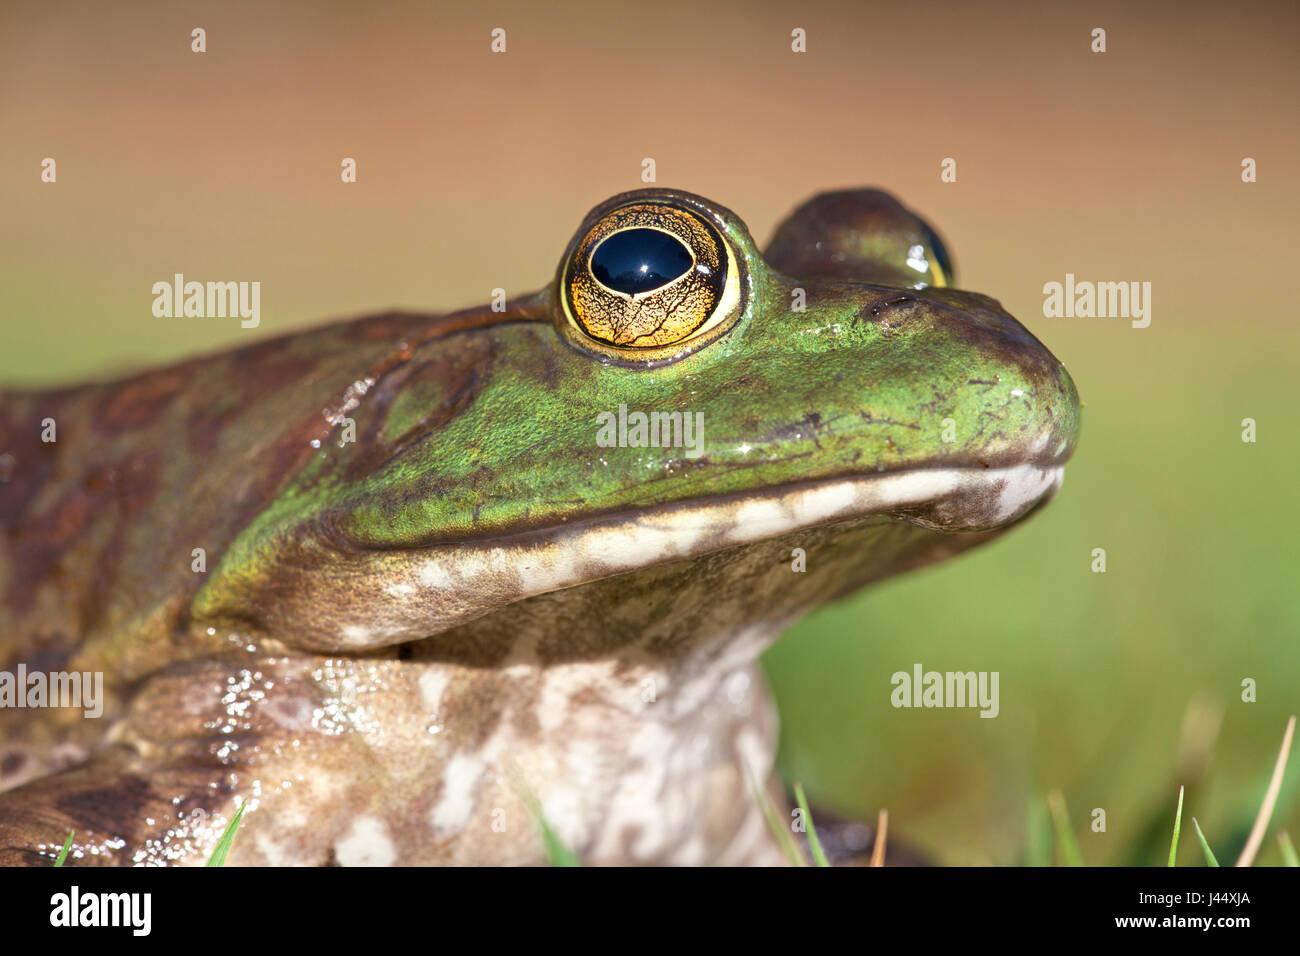 portrait of a North American Bullfrog - Stock Image